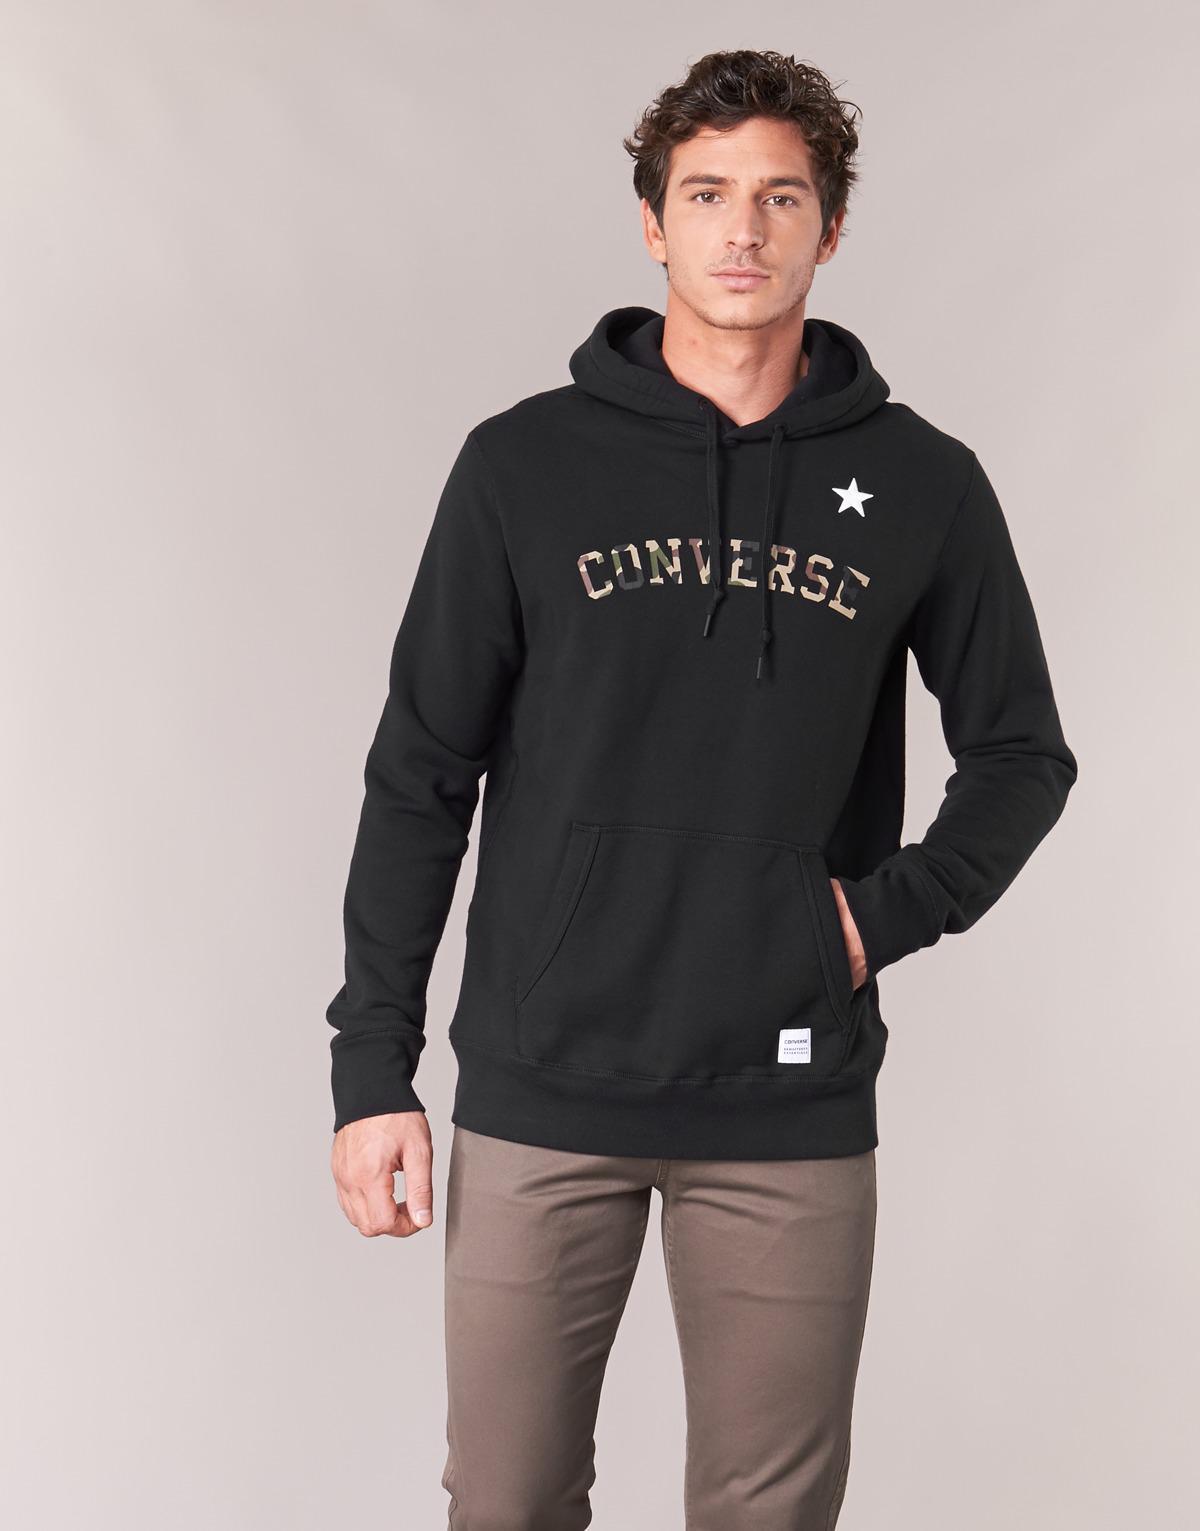 88e98ed8d8d0 Converse Essentials Camo Star Pullover Hoodie Men s Sweatshirt In ...